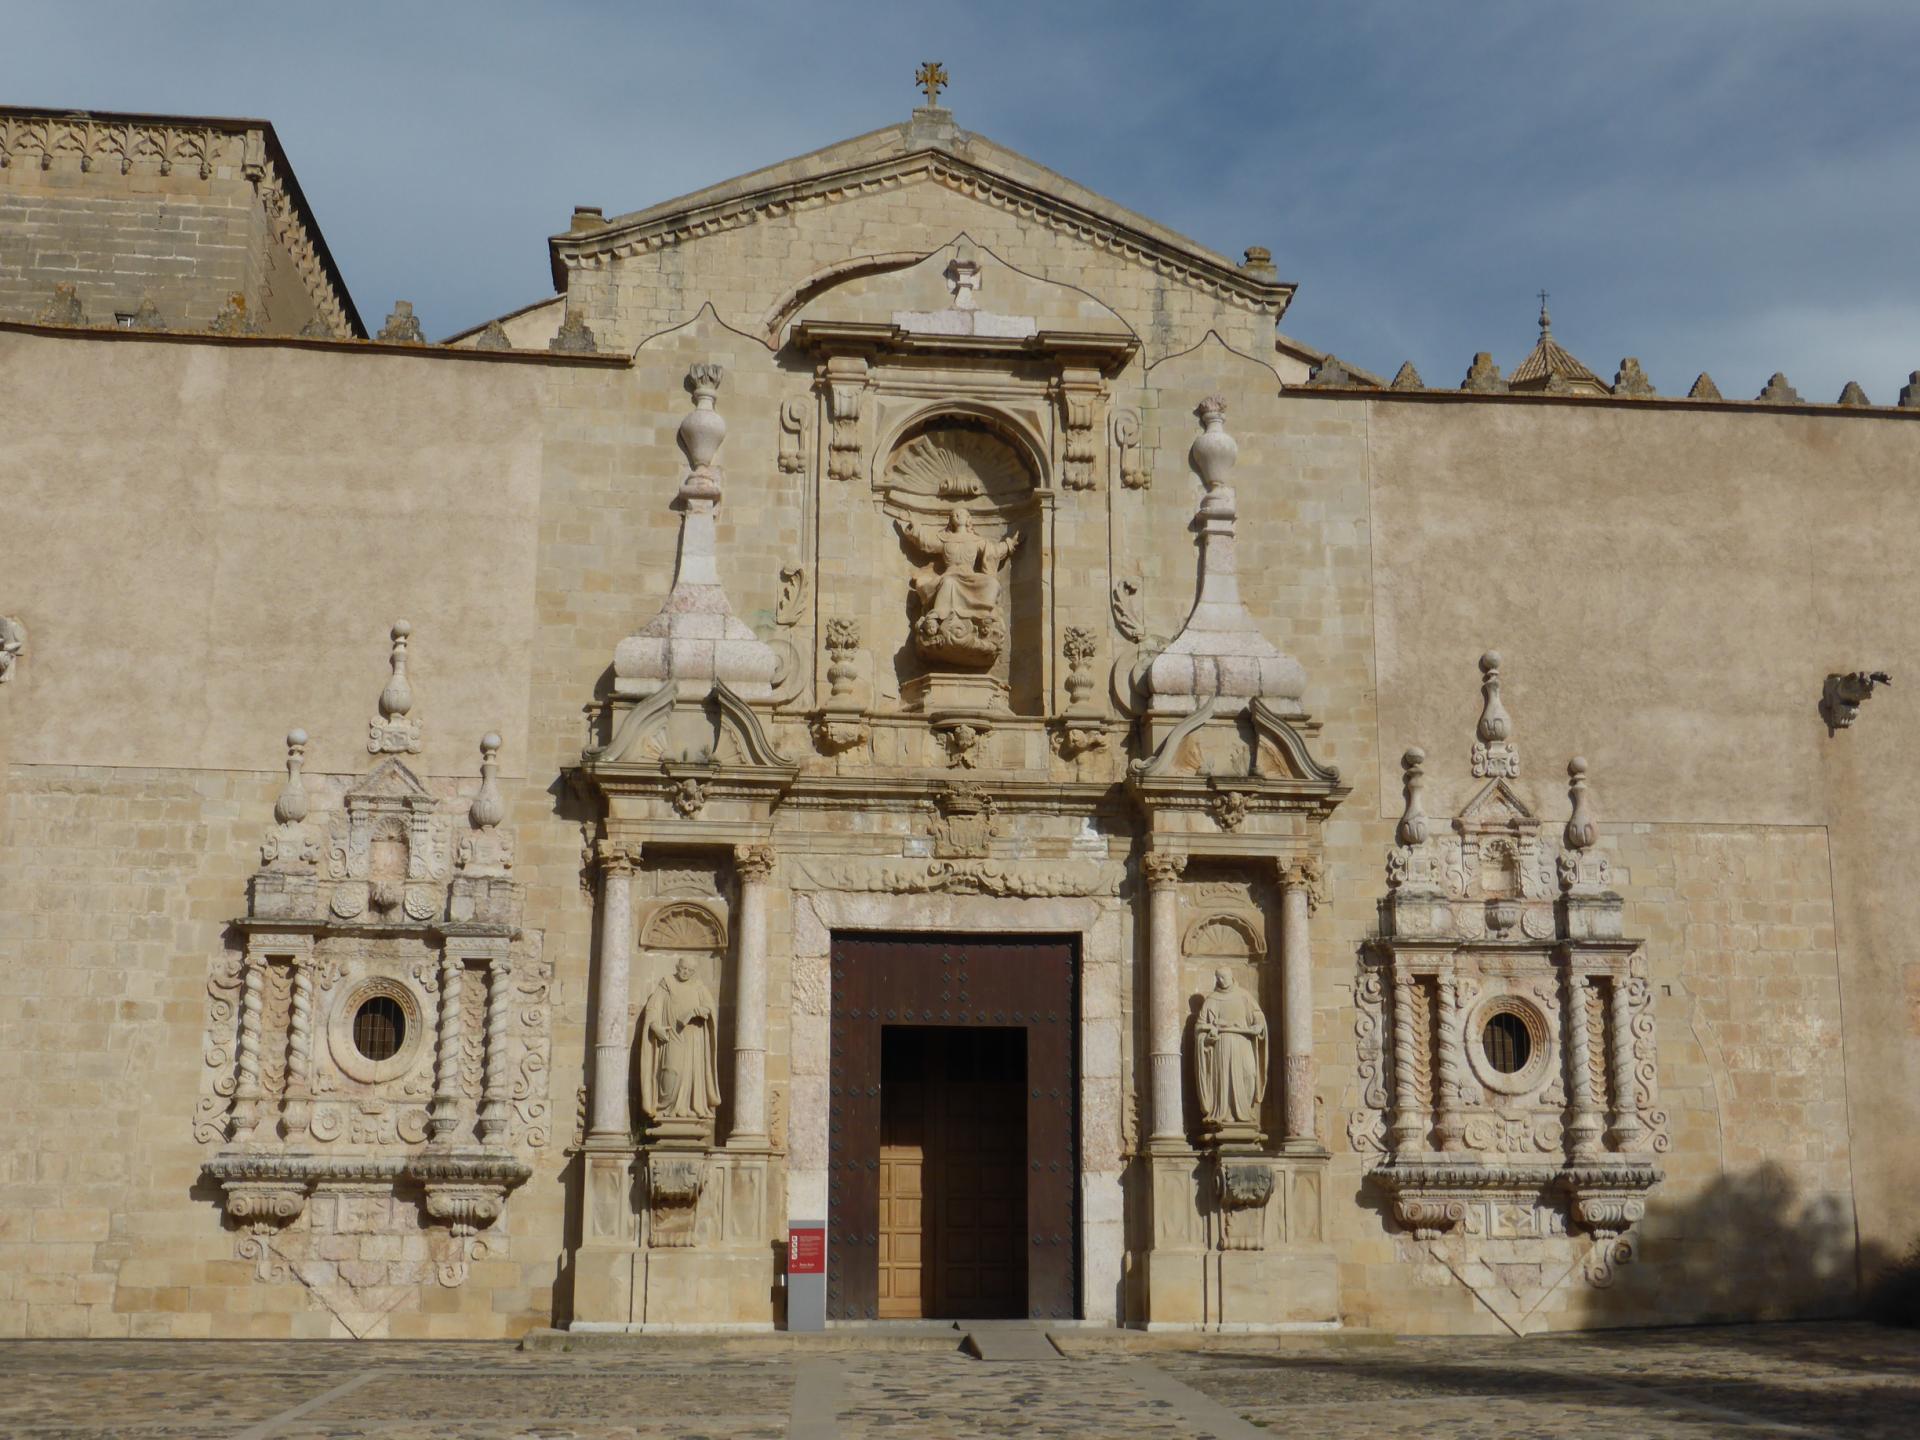 Monastère royal Santa Maria de Poblet, XVIIe siècle, cl. Ph. Cachau